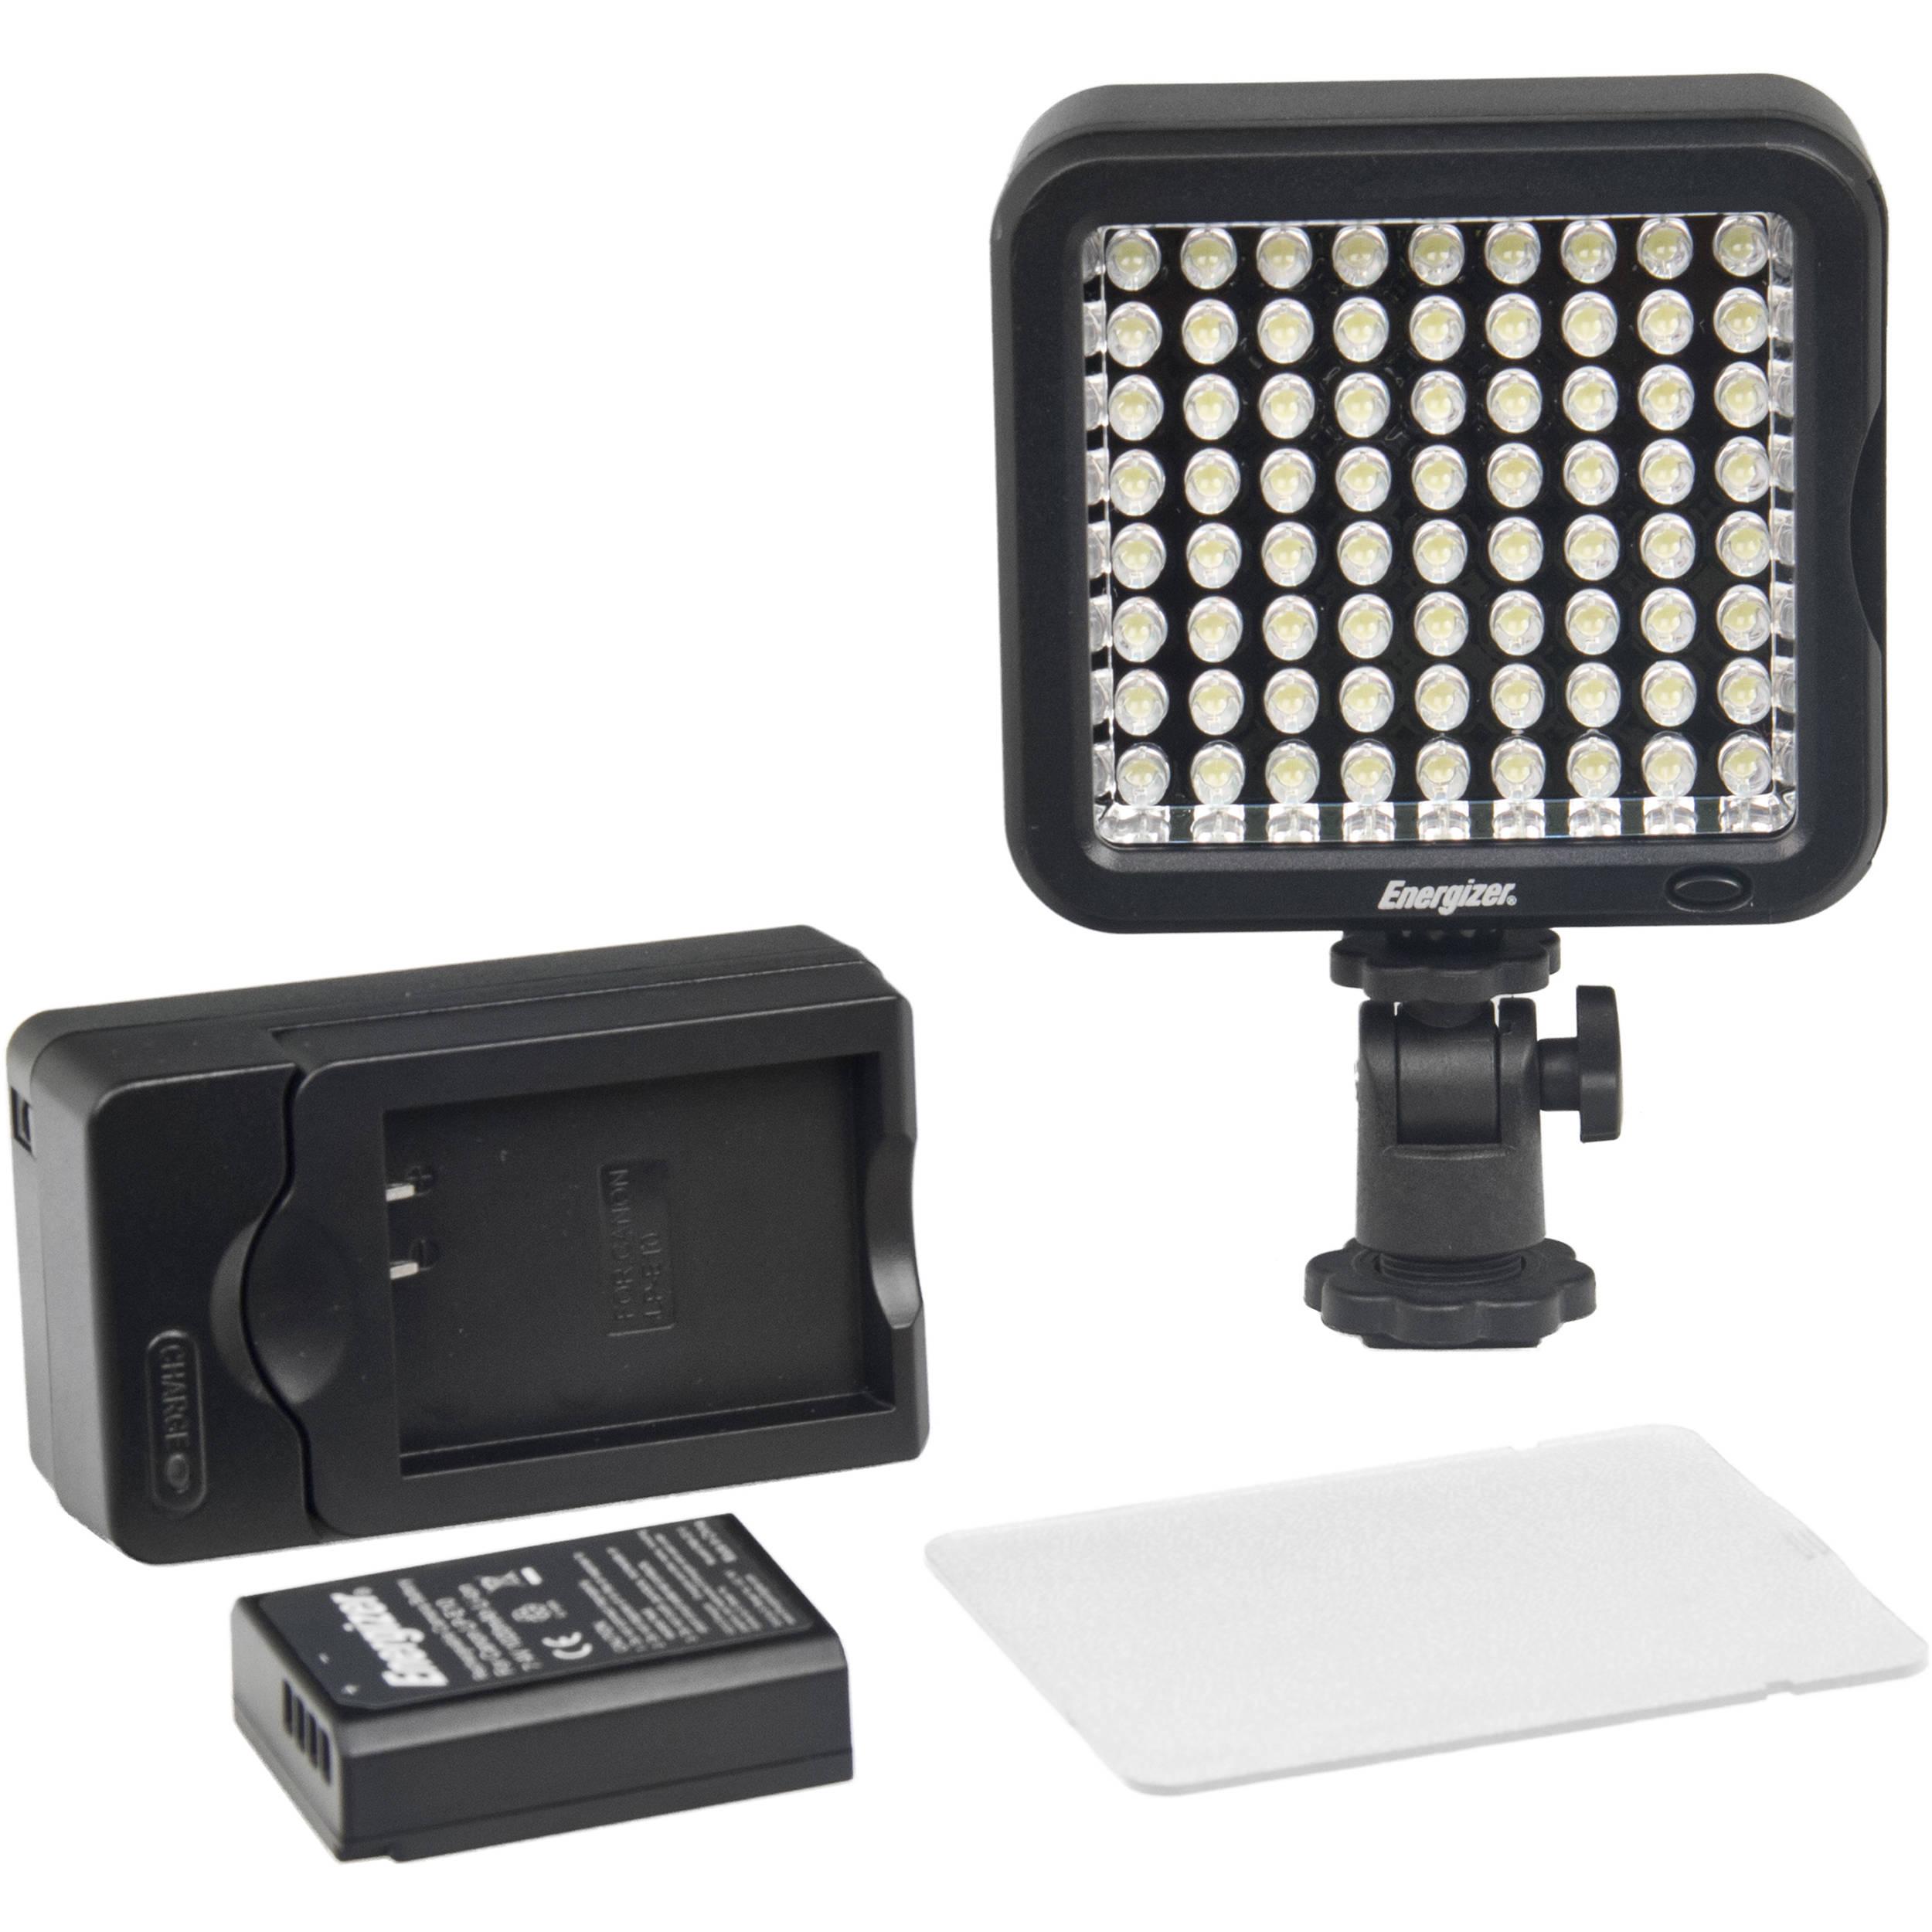 Energizer 72-Bulb LED Video Light (Daylight)